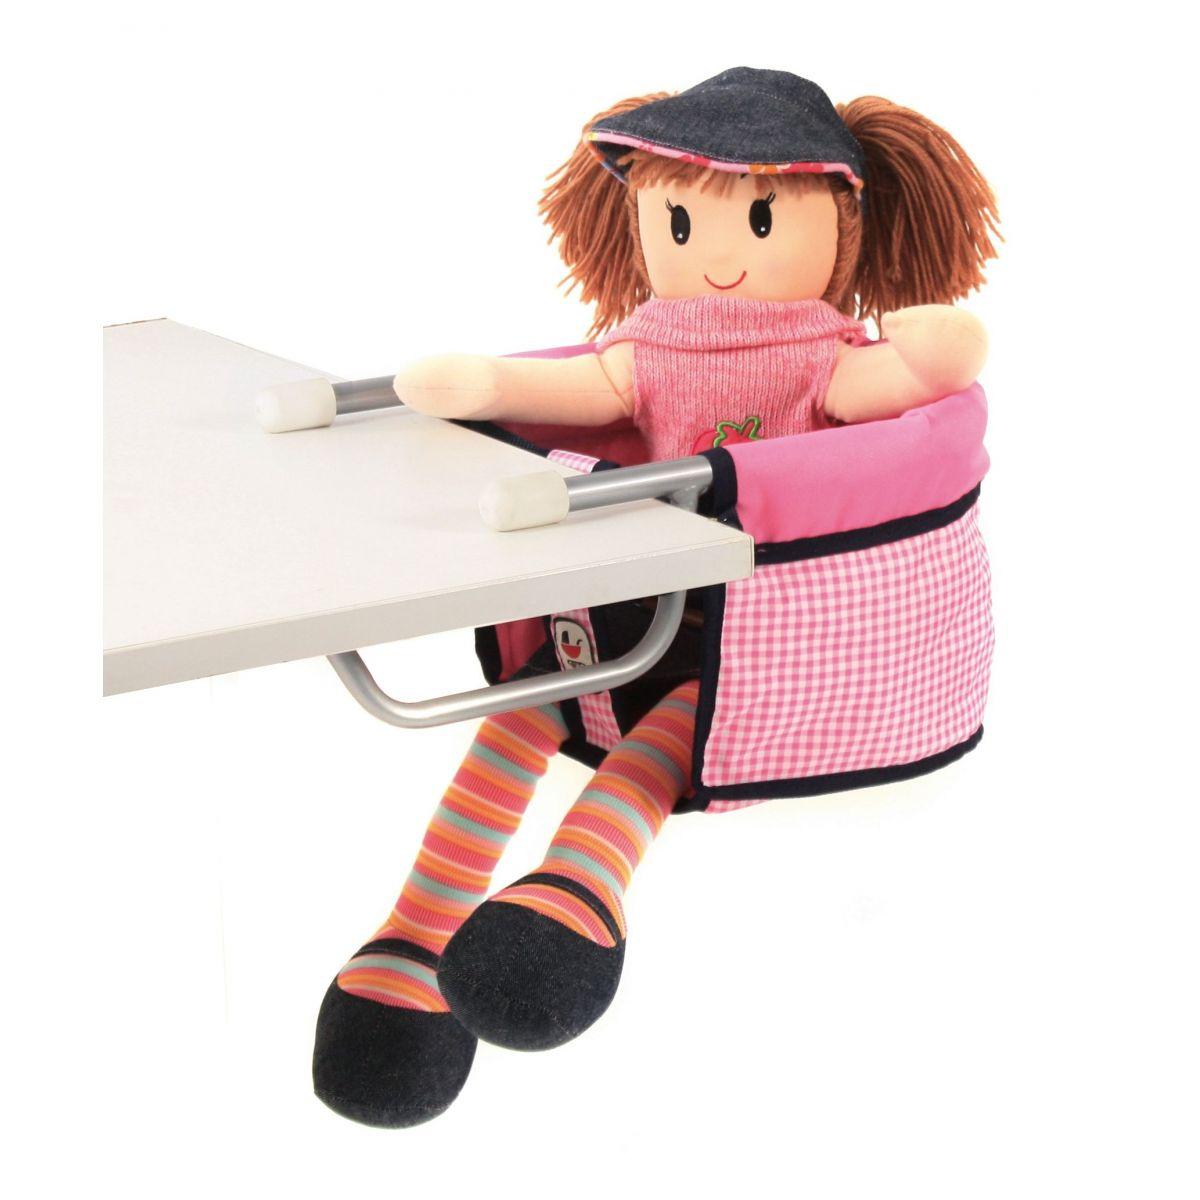 Bayer Chic Sedačka ke stolu pro panenku - pink checker